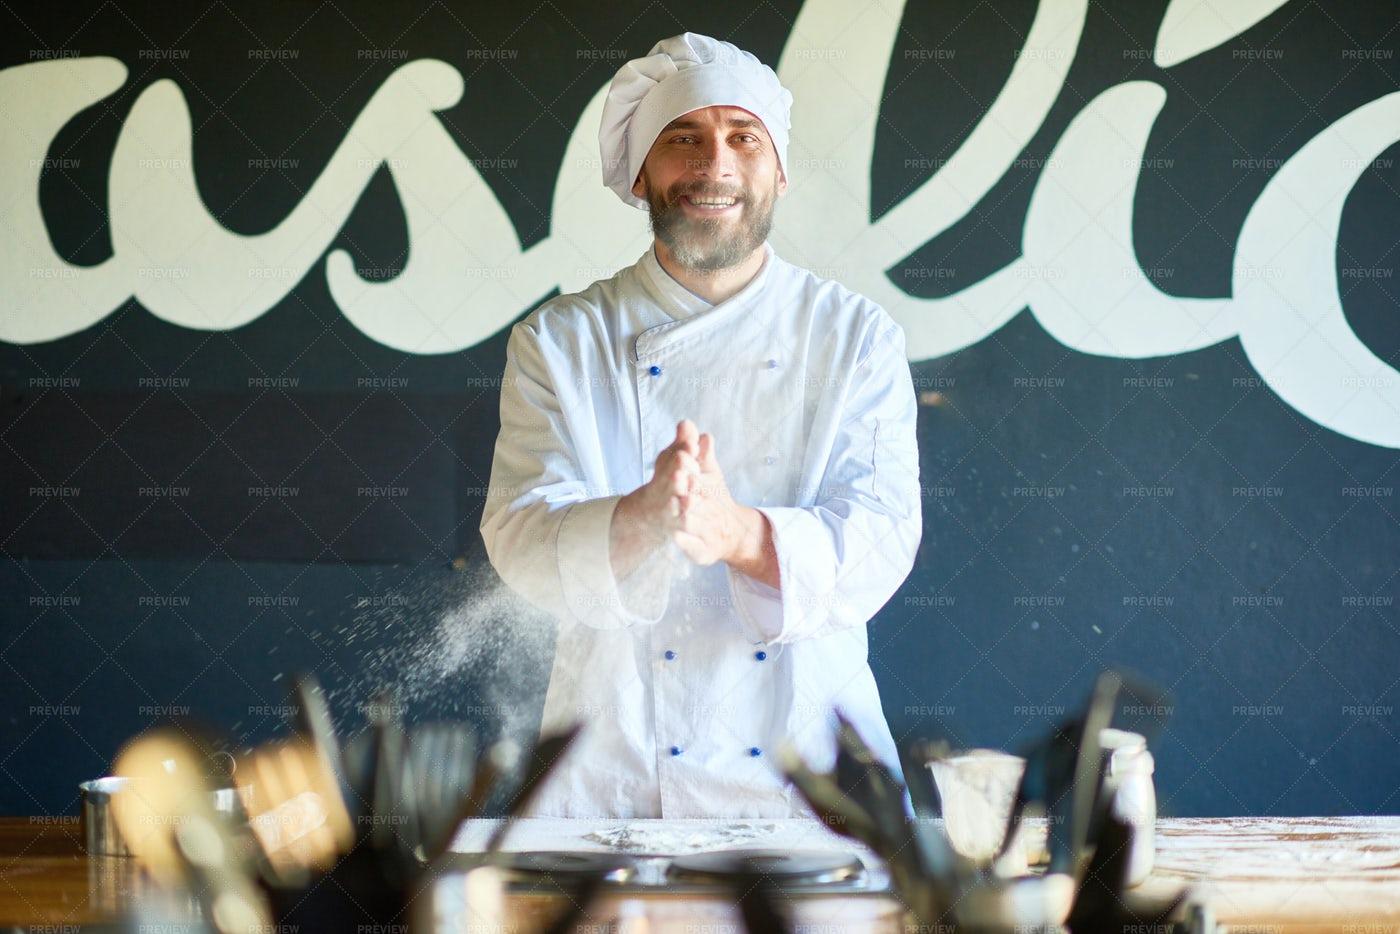 Portrait Of Cheerful Bearded Chef: Stock Photos